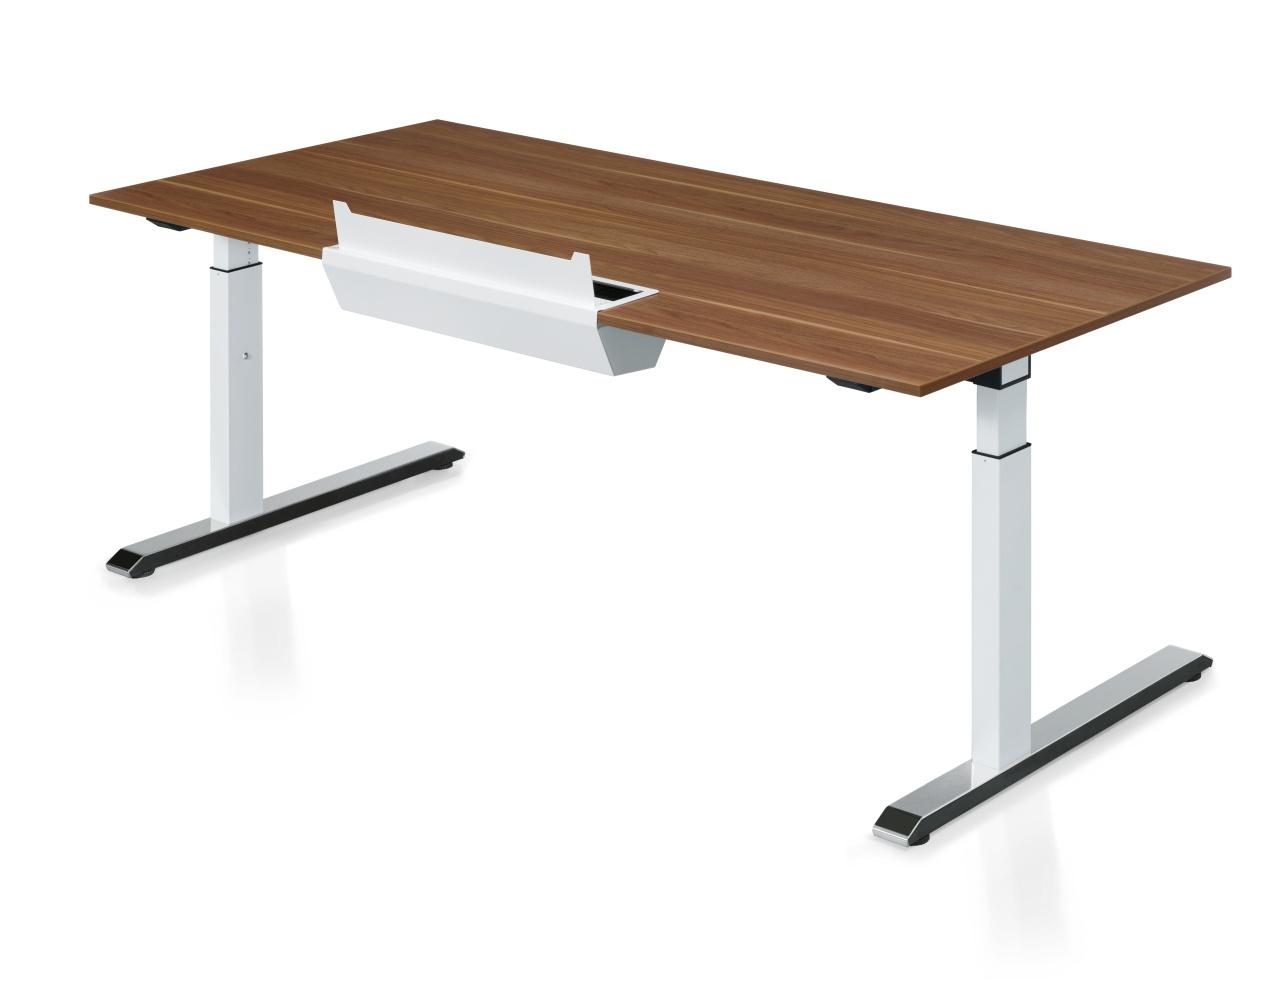 sedus temptation c zdrowe biuro i ergonomia pracy. Black Bedroom Furniture Sets. Home Design Ideas